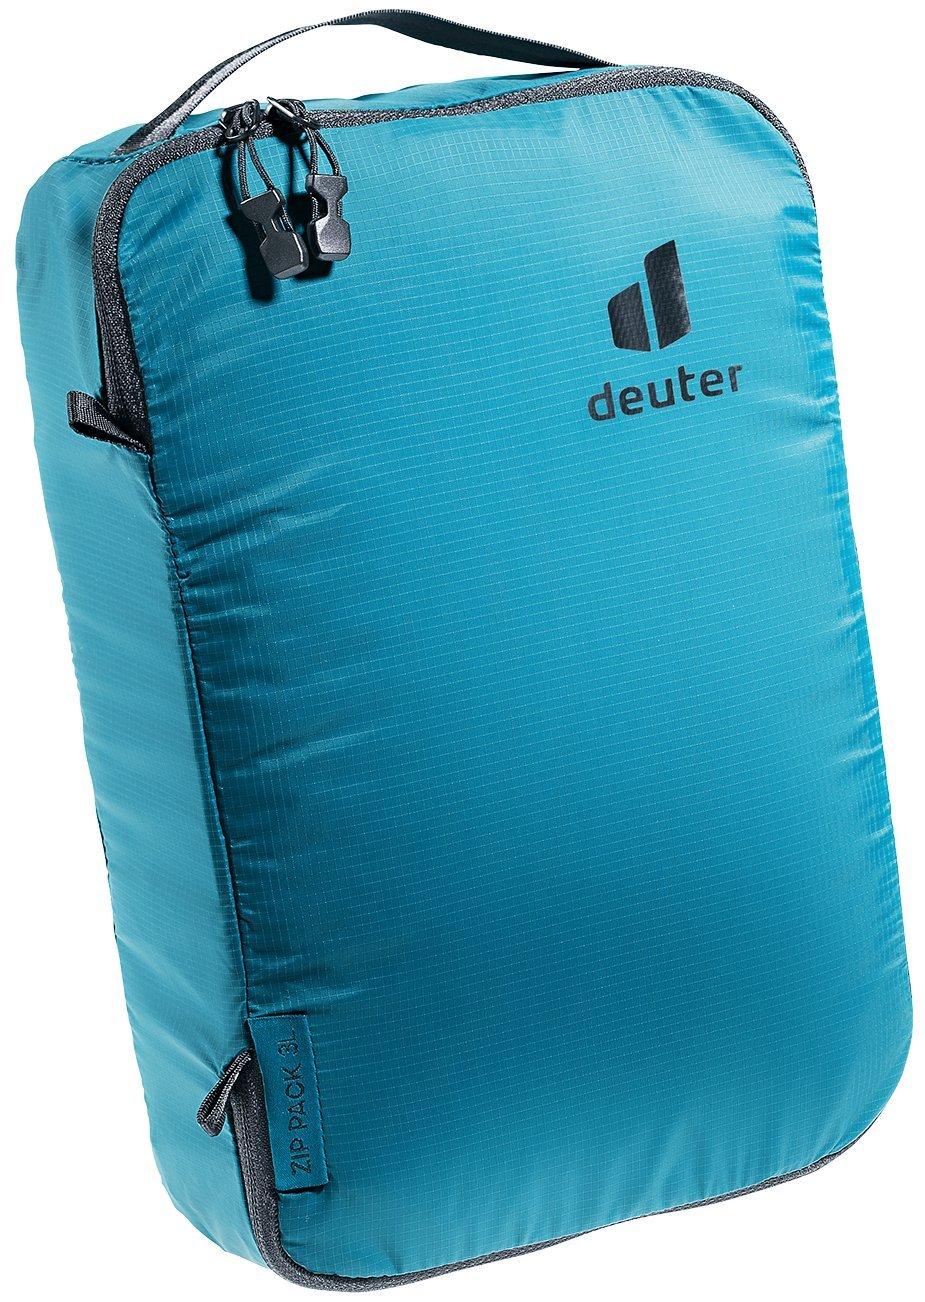 Новинки Упаковочный мешок Deuter Zip Pack 3 (2021) 3941521-3007-ZipPack3-w20-d0.jpg